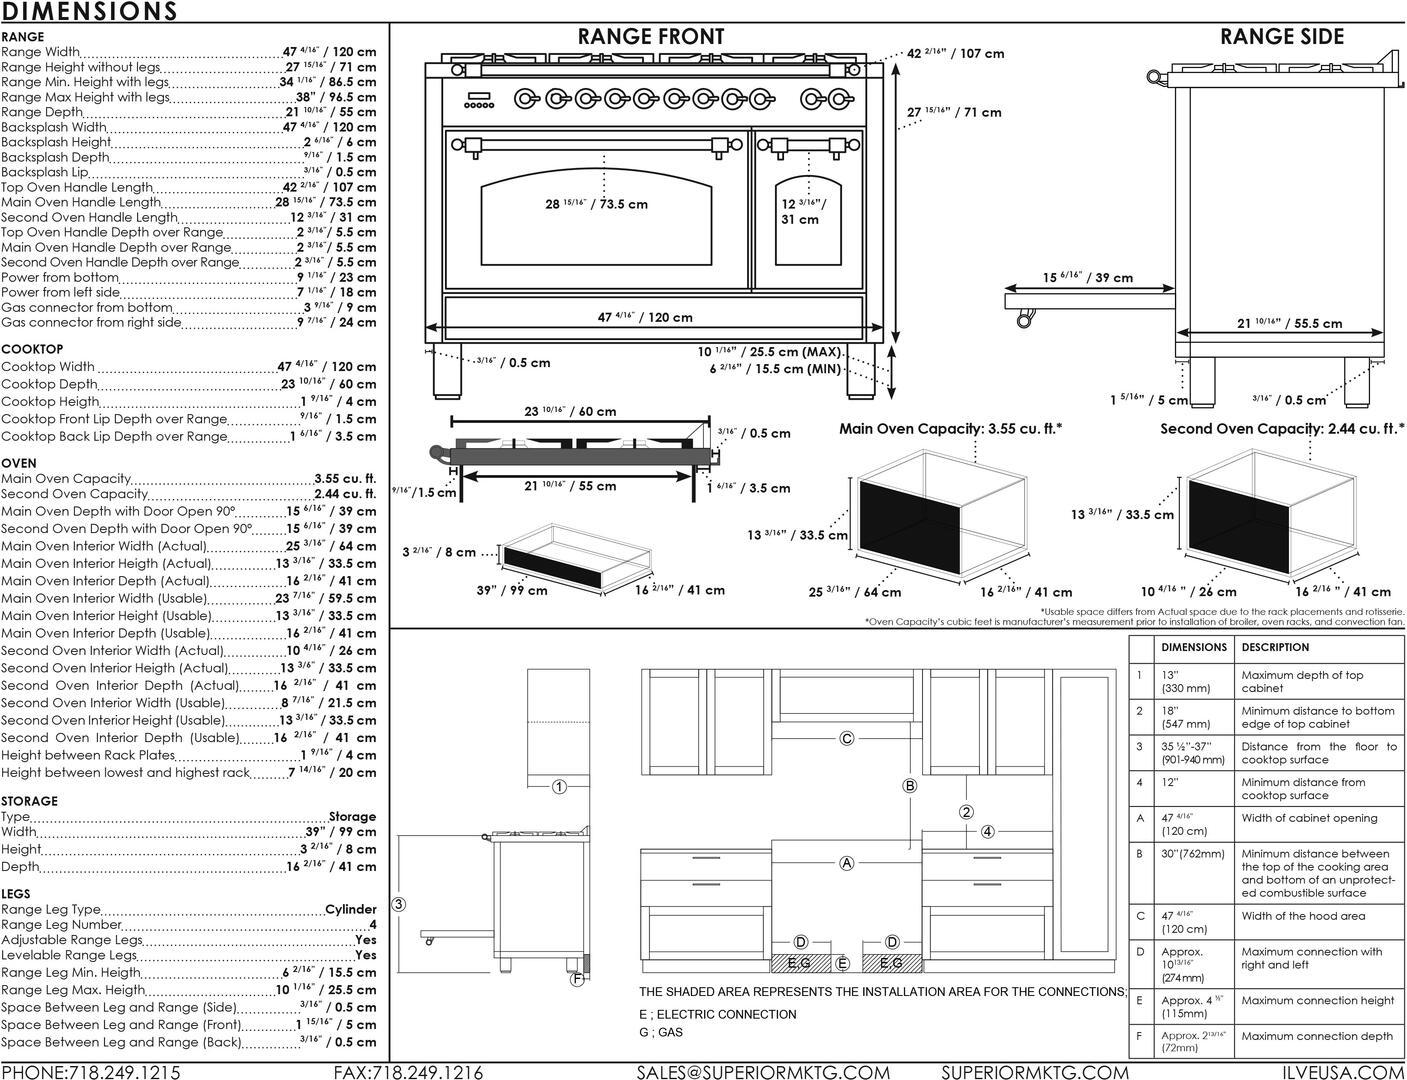 Ilve Nostalgie UPN120FDMPBLX Freestanding Dual Fuel Range Blue, UPN120FDM Dimensions Guide